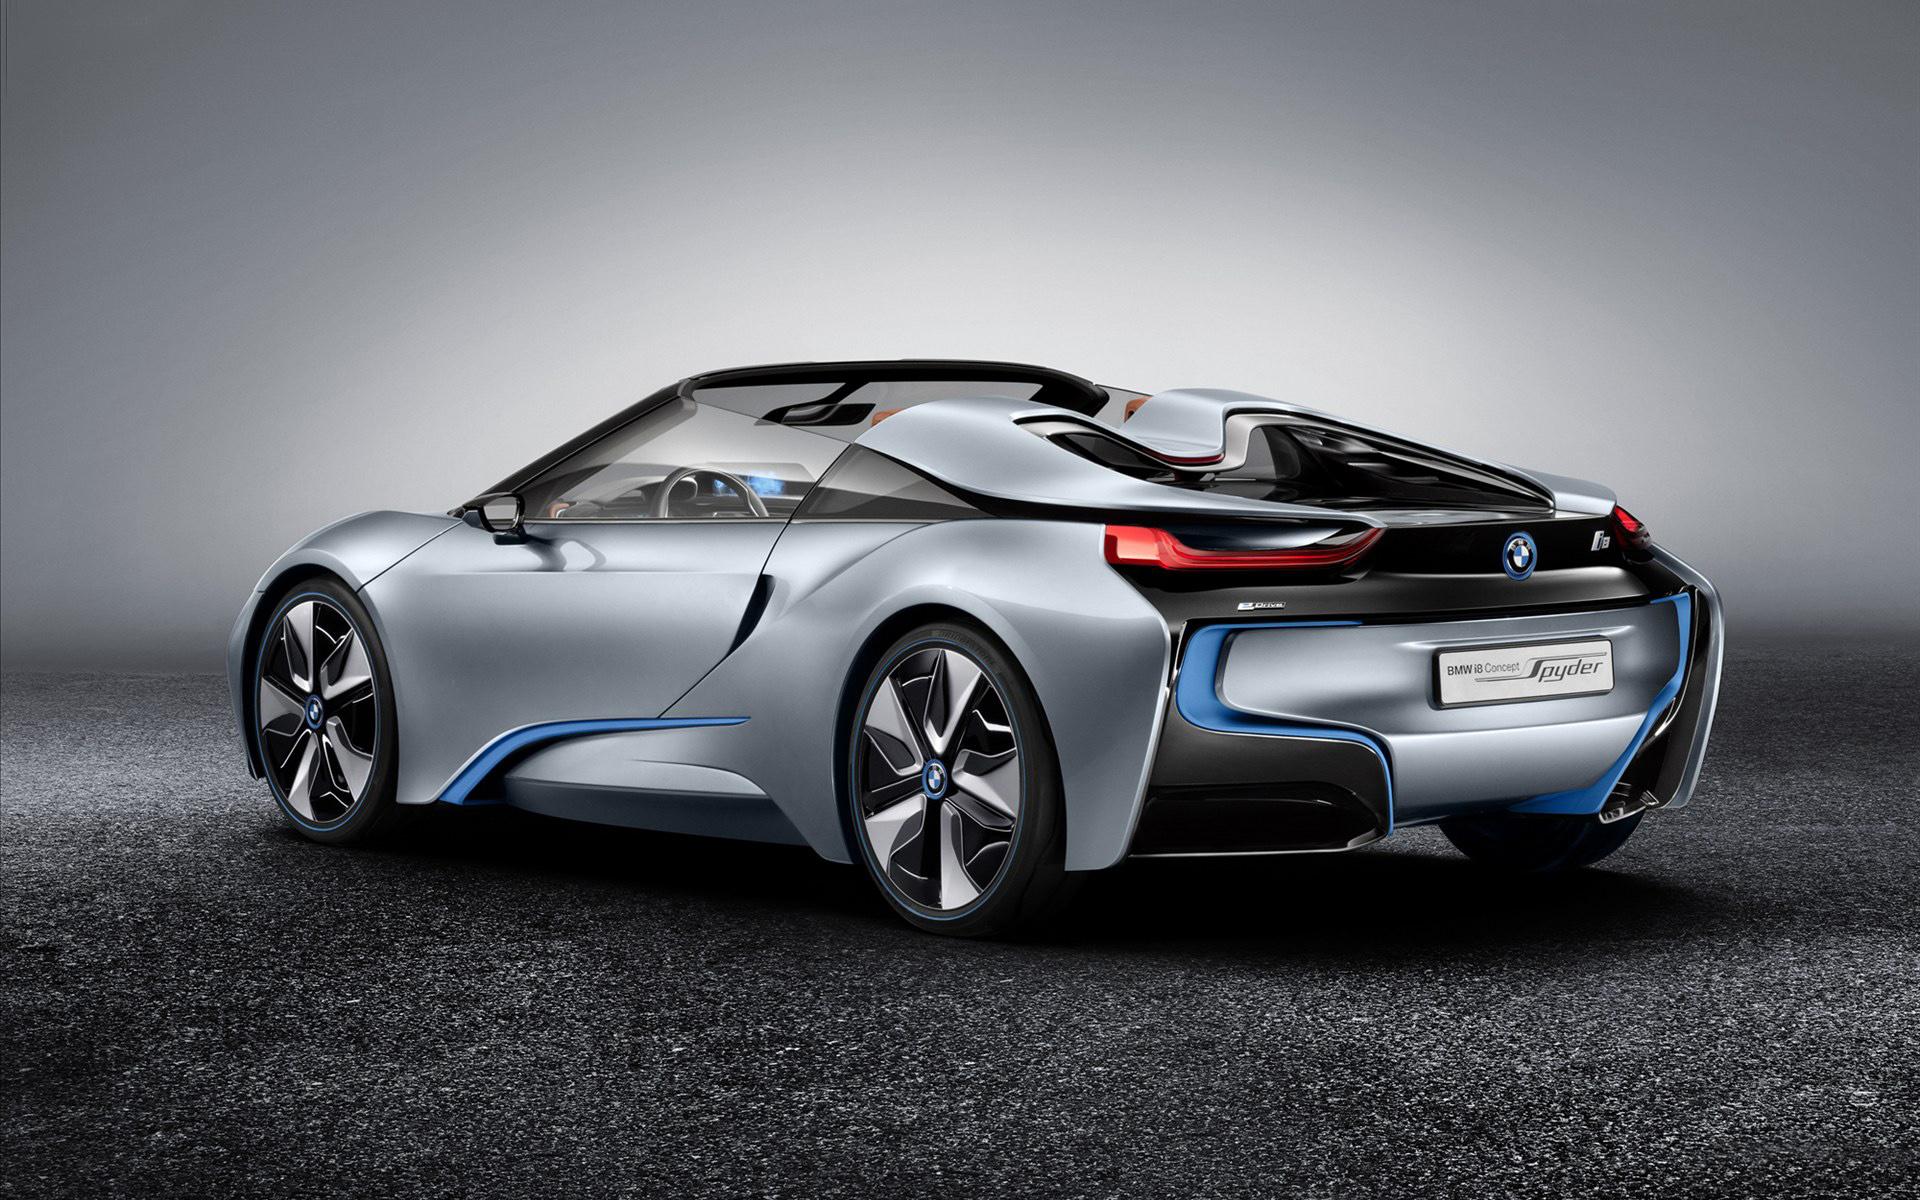 Bmw I8 Car Concept 4k Hd Desktop Wallpaper For 4k Ultra Hd: BMW I8 Spyder Concept 2012 4 Wallpaper